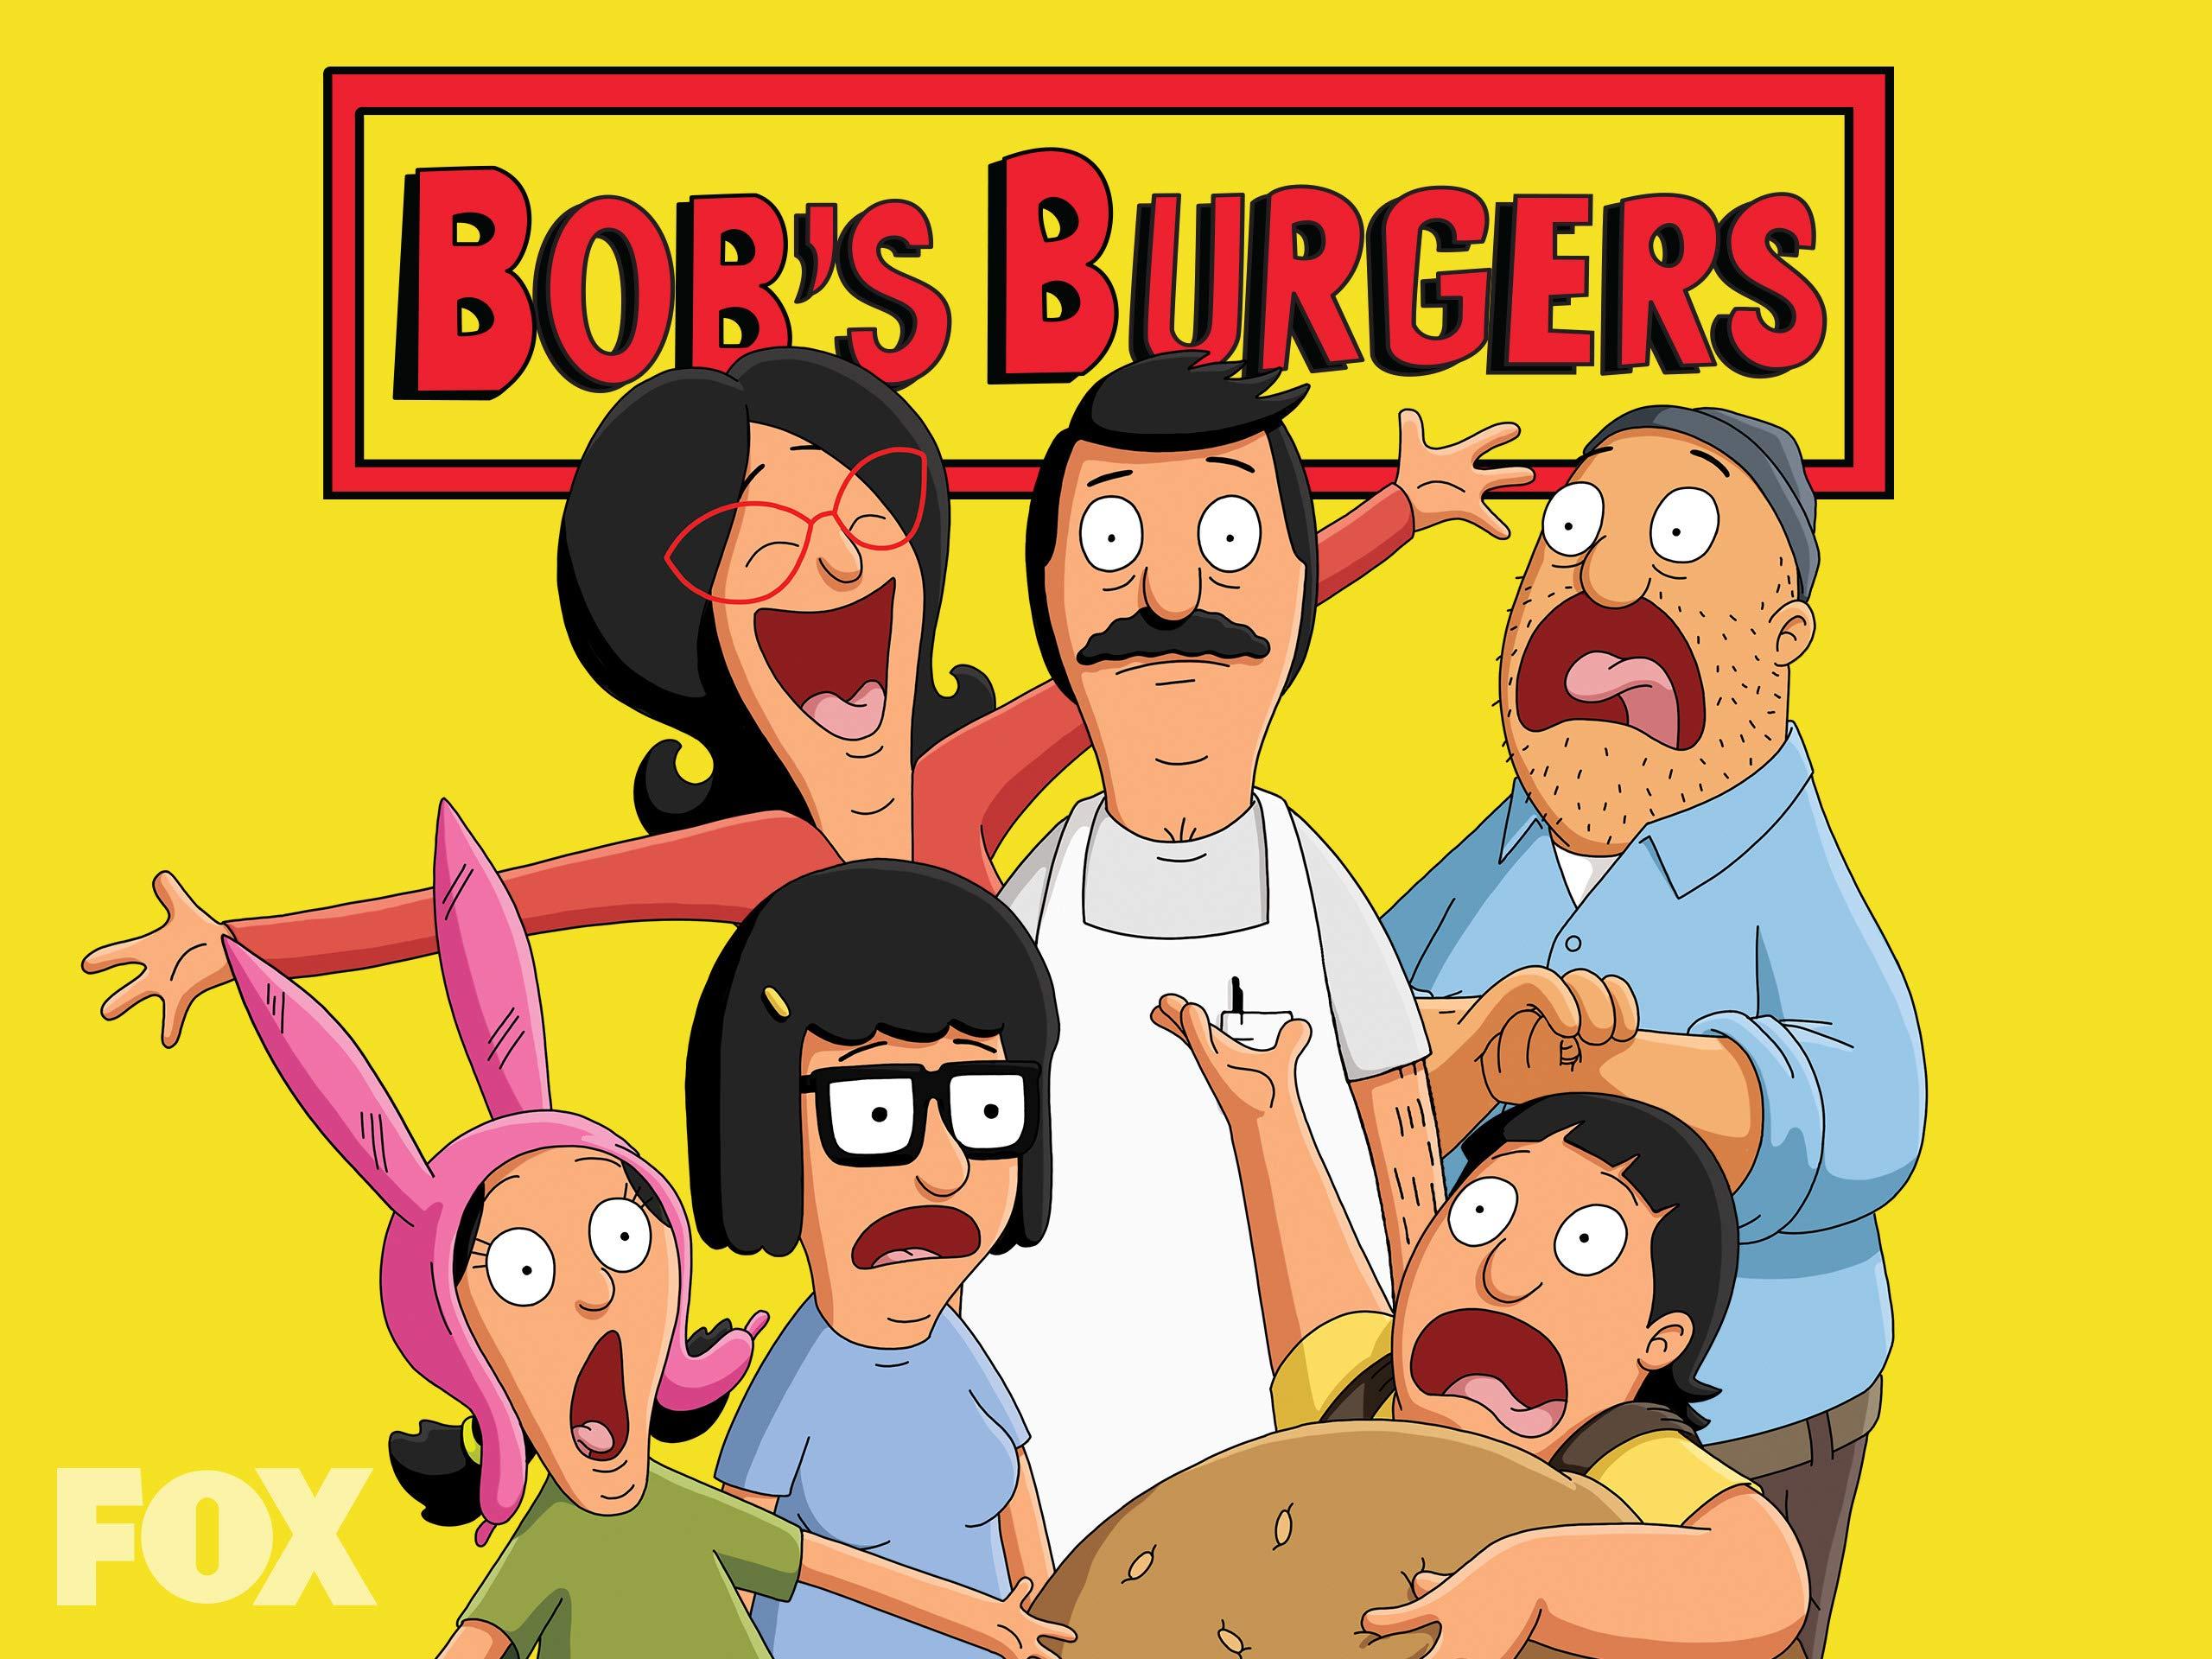 bobs burgers season 1 episode 1 online free